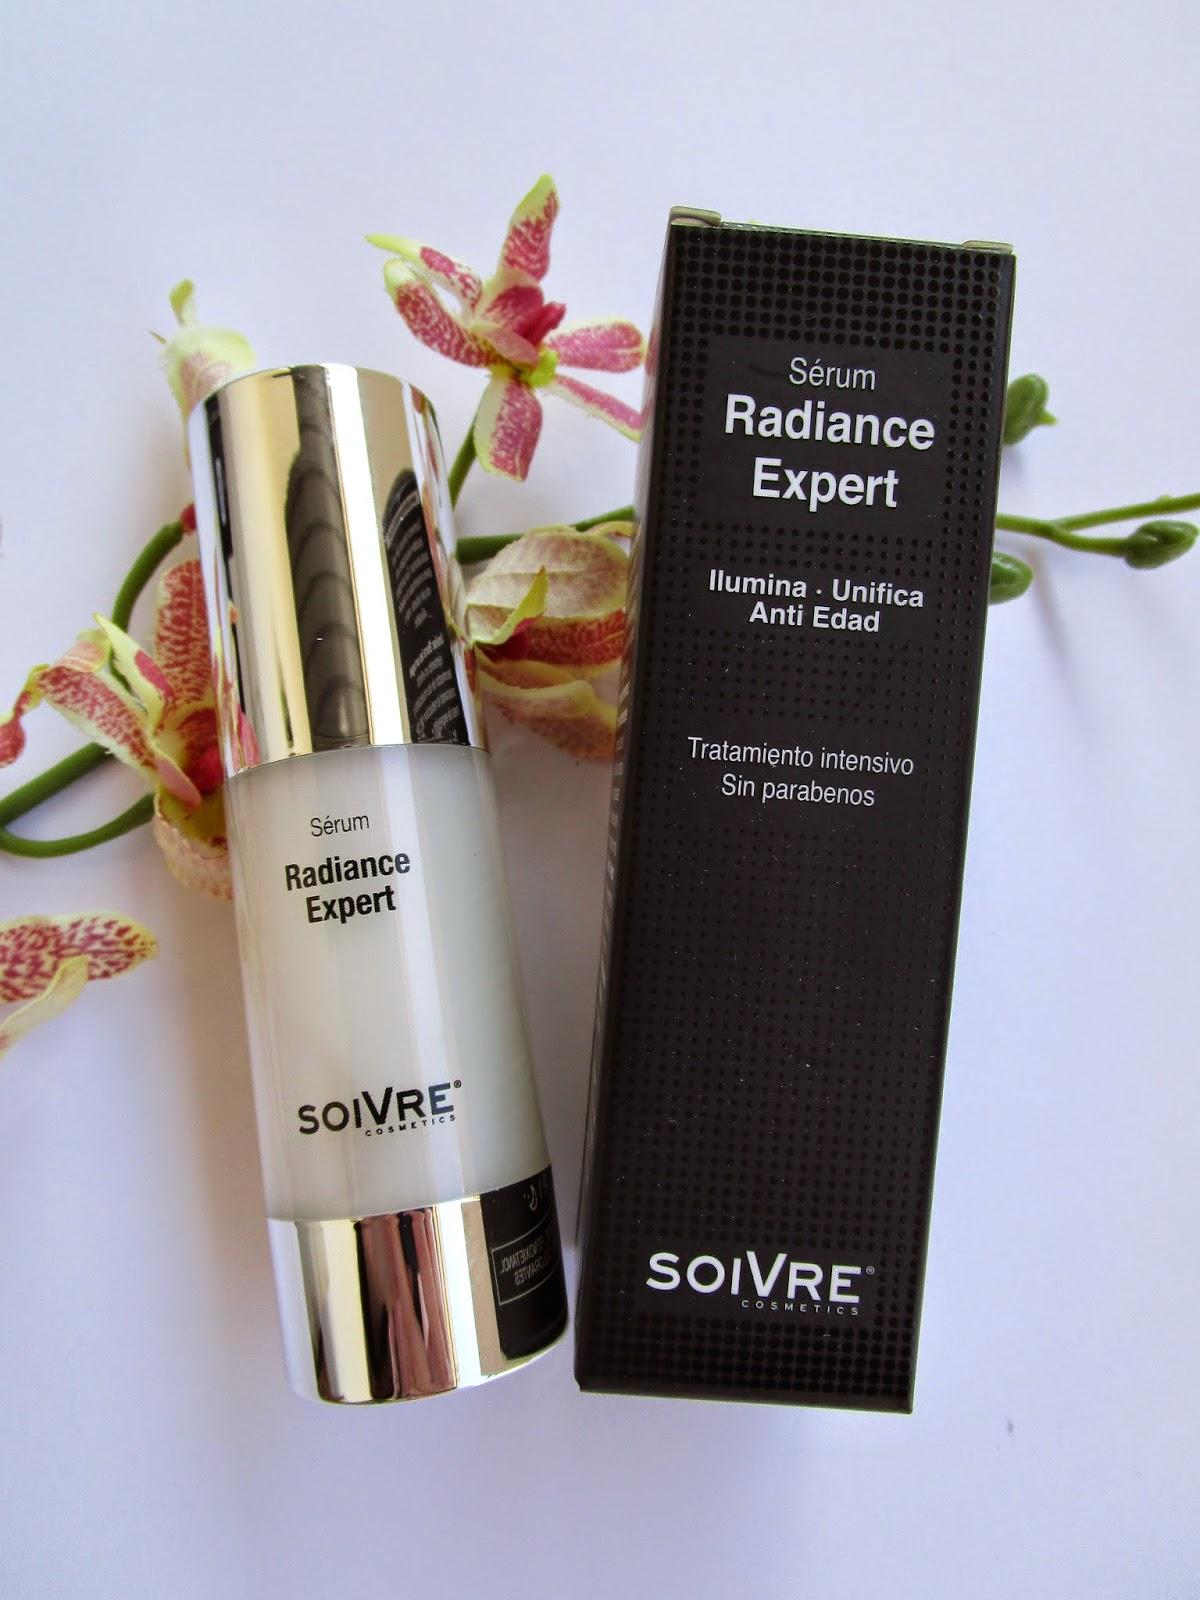 Serum Radiance Expert Soivre Cosmetics